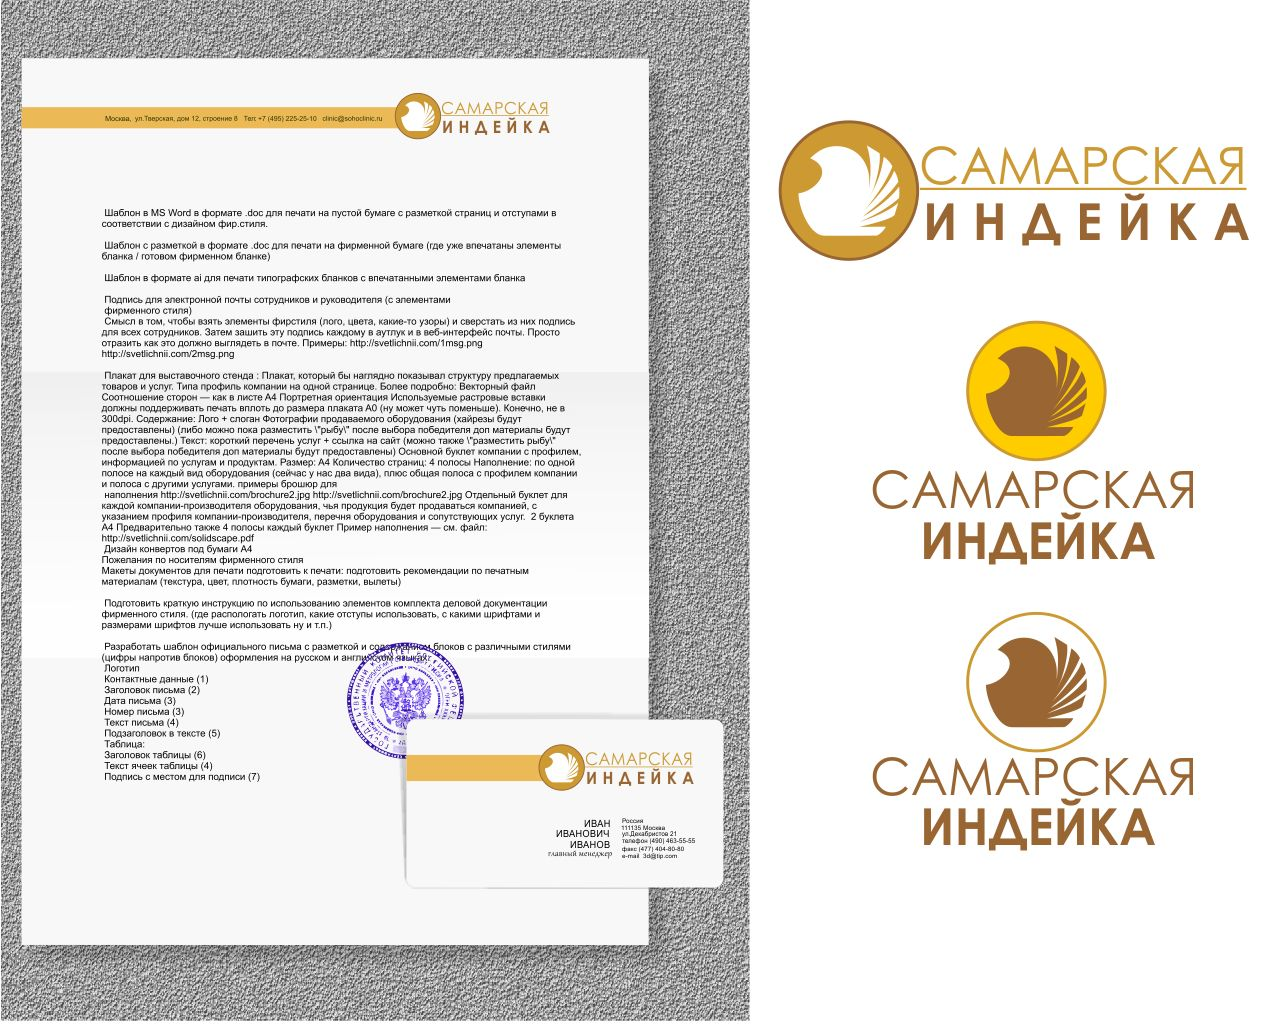 Создание логотипа Сельхоз производителя фото f_33055df274aea3a2.jpg